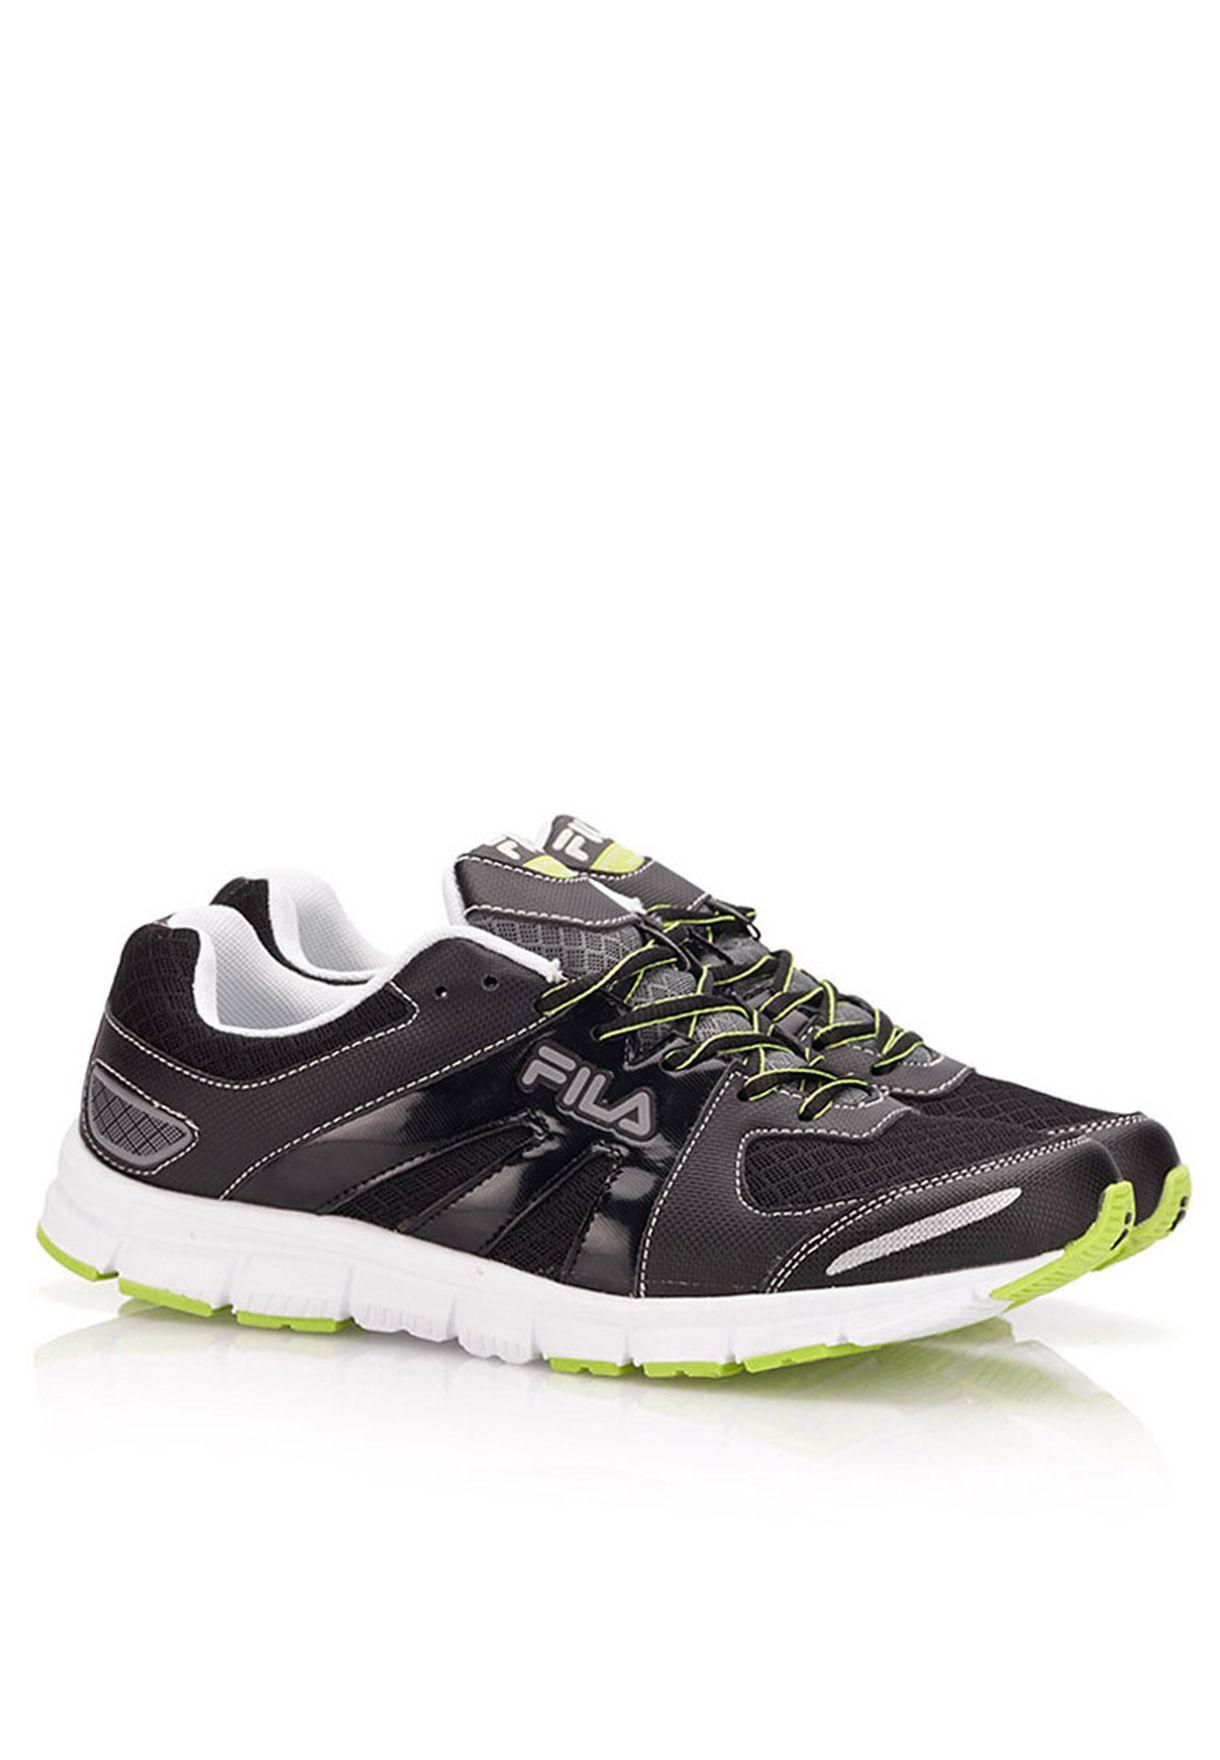 36e4dfa8a تسوق Sports Shoes ماركة فيلا لون أسود 391R174-112 في البحرين ...